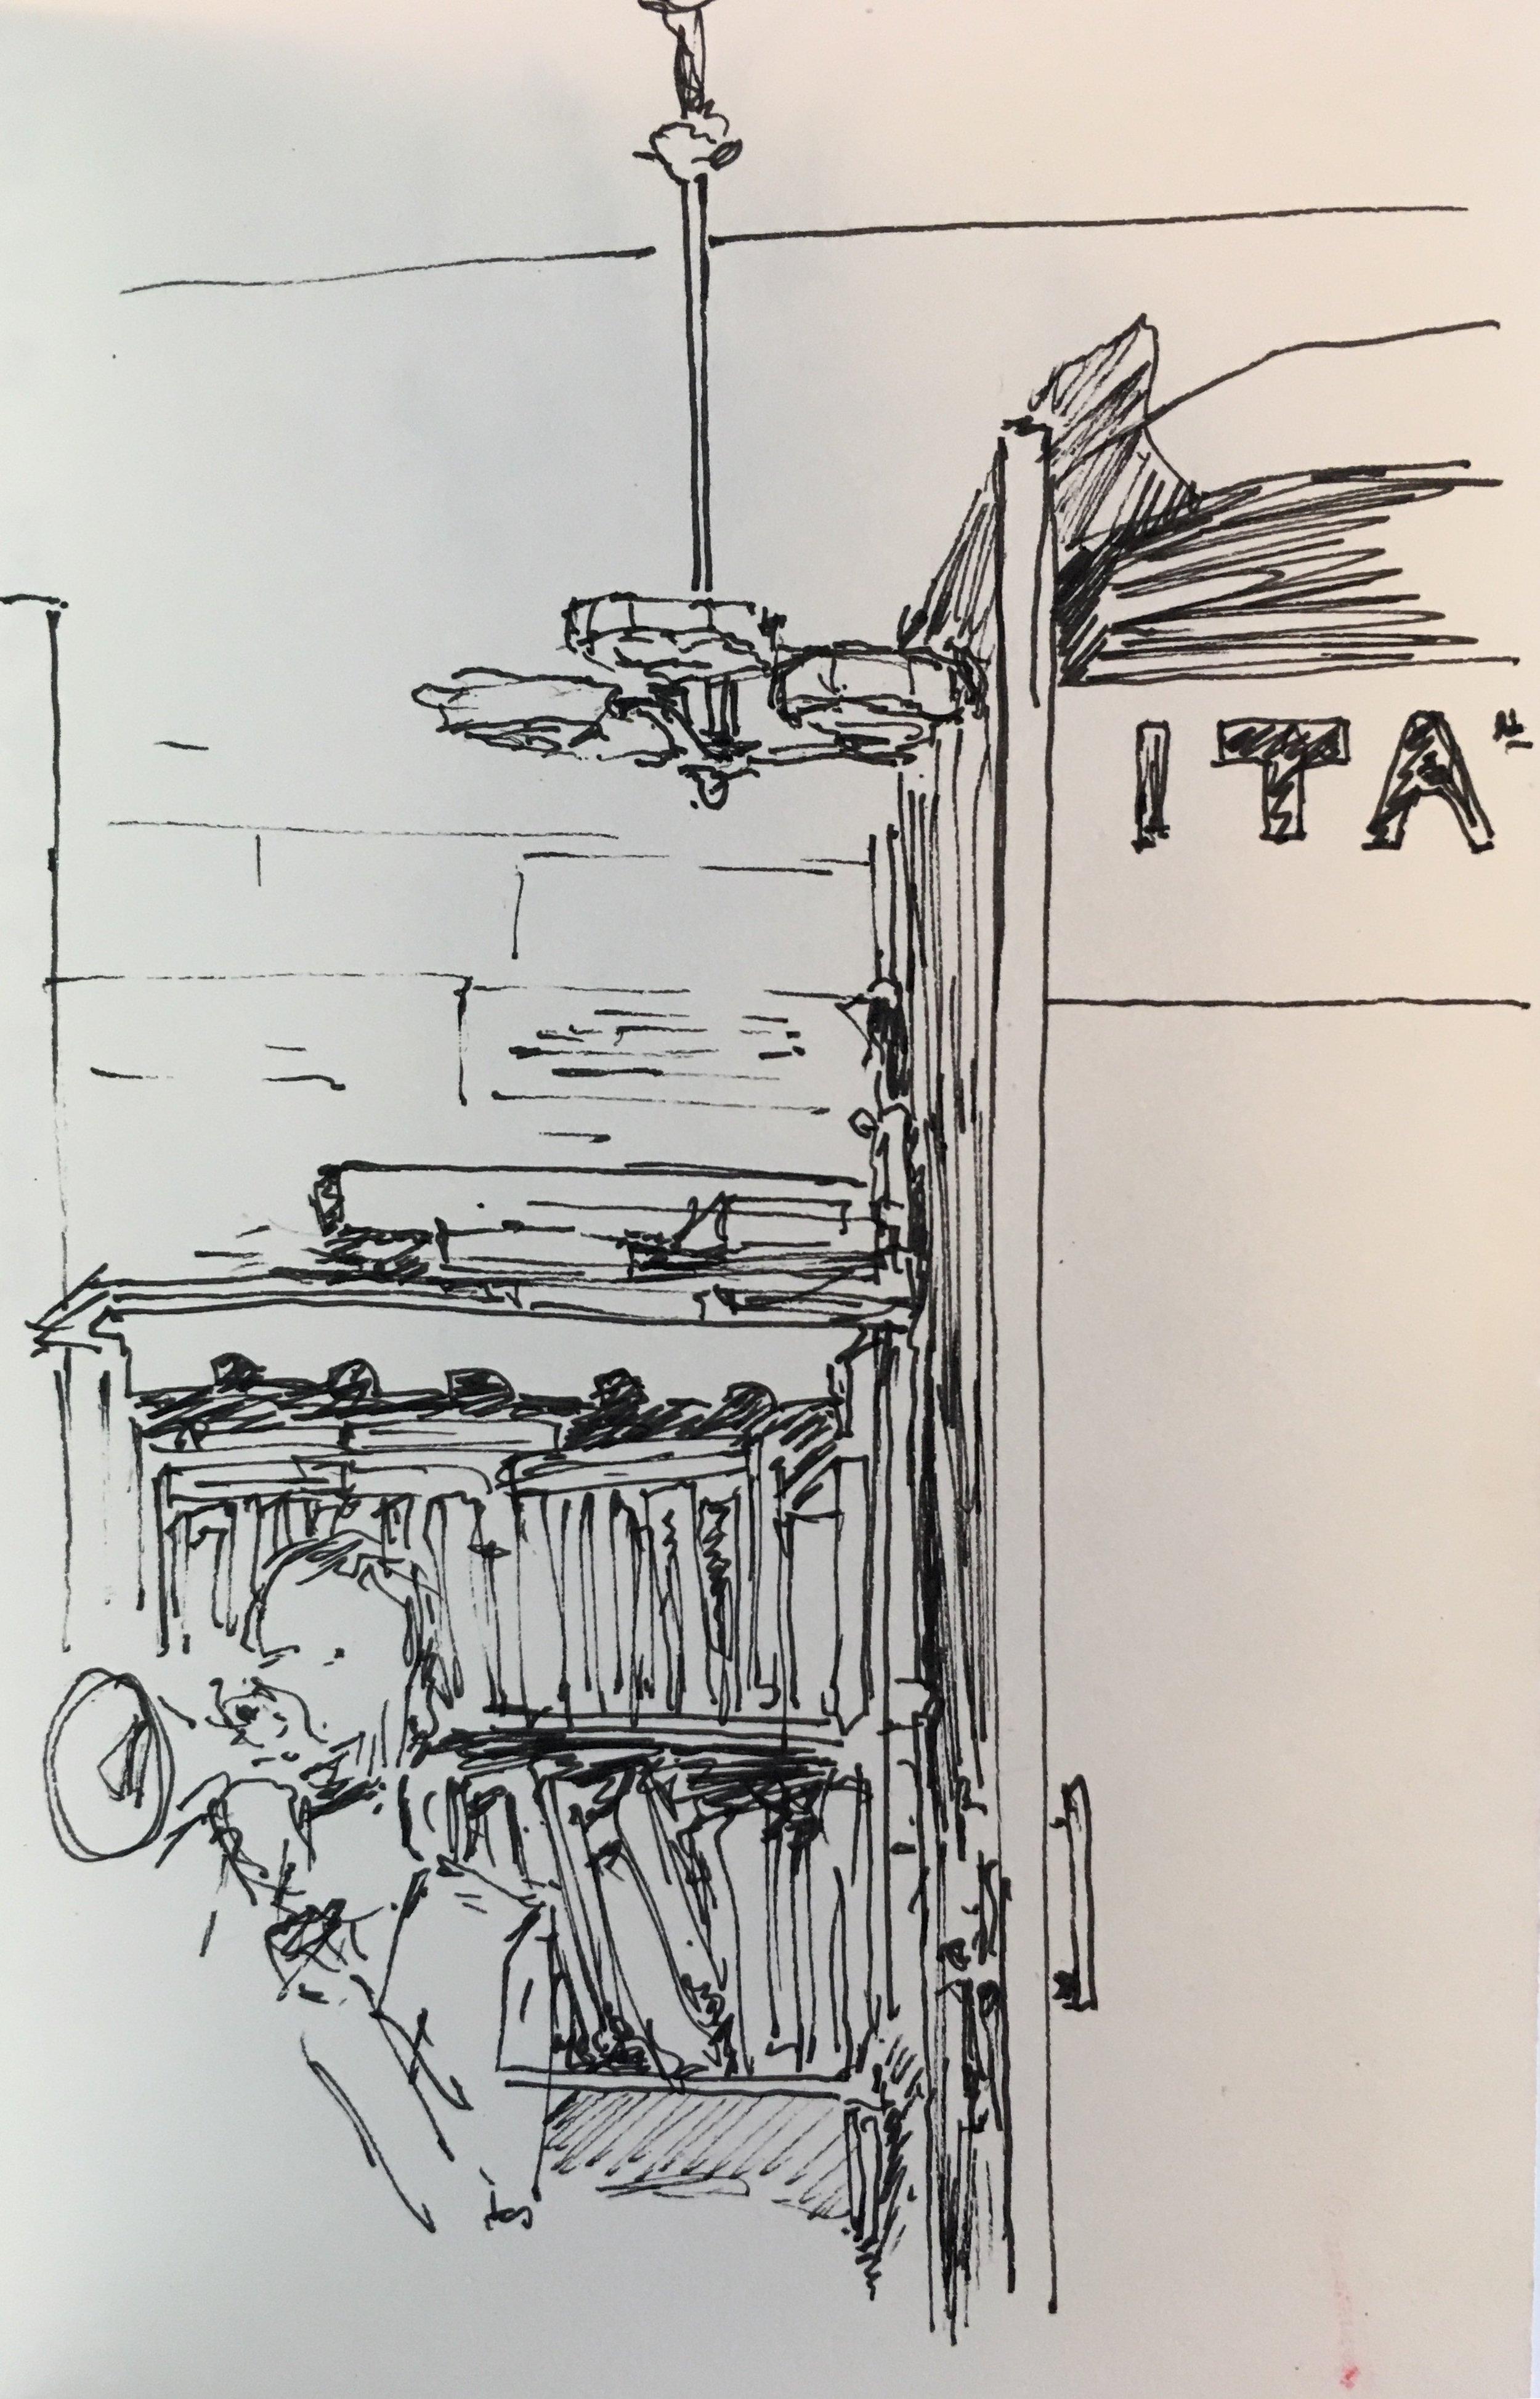 Jazz jam at Café Tati, Lisbon, 2017.